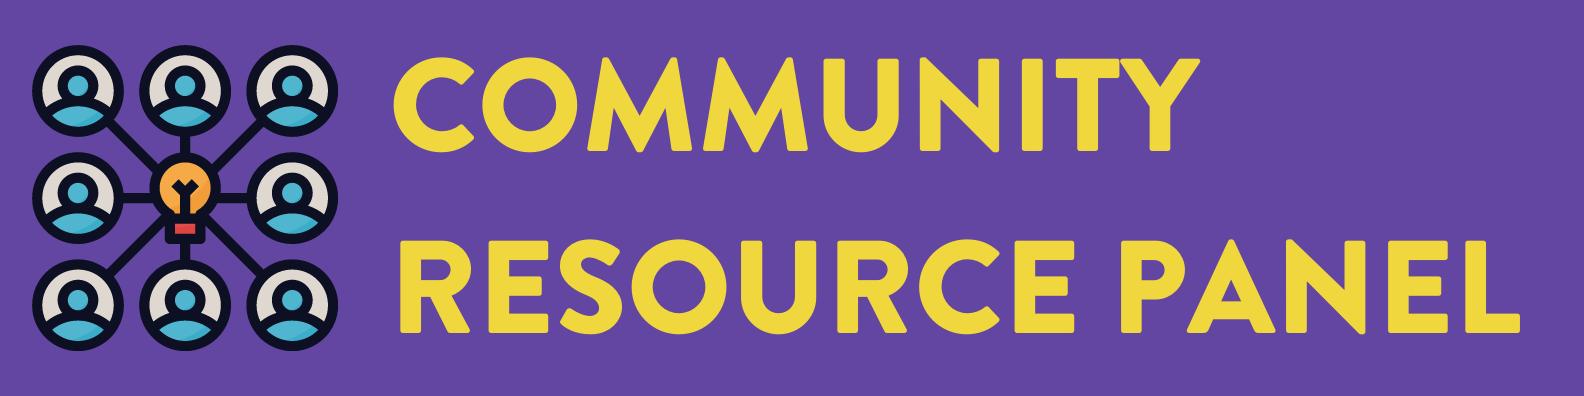 Community Resource Panel